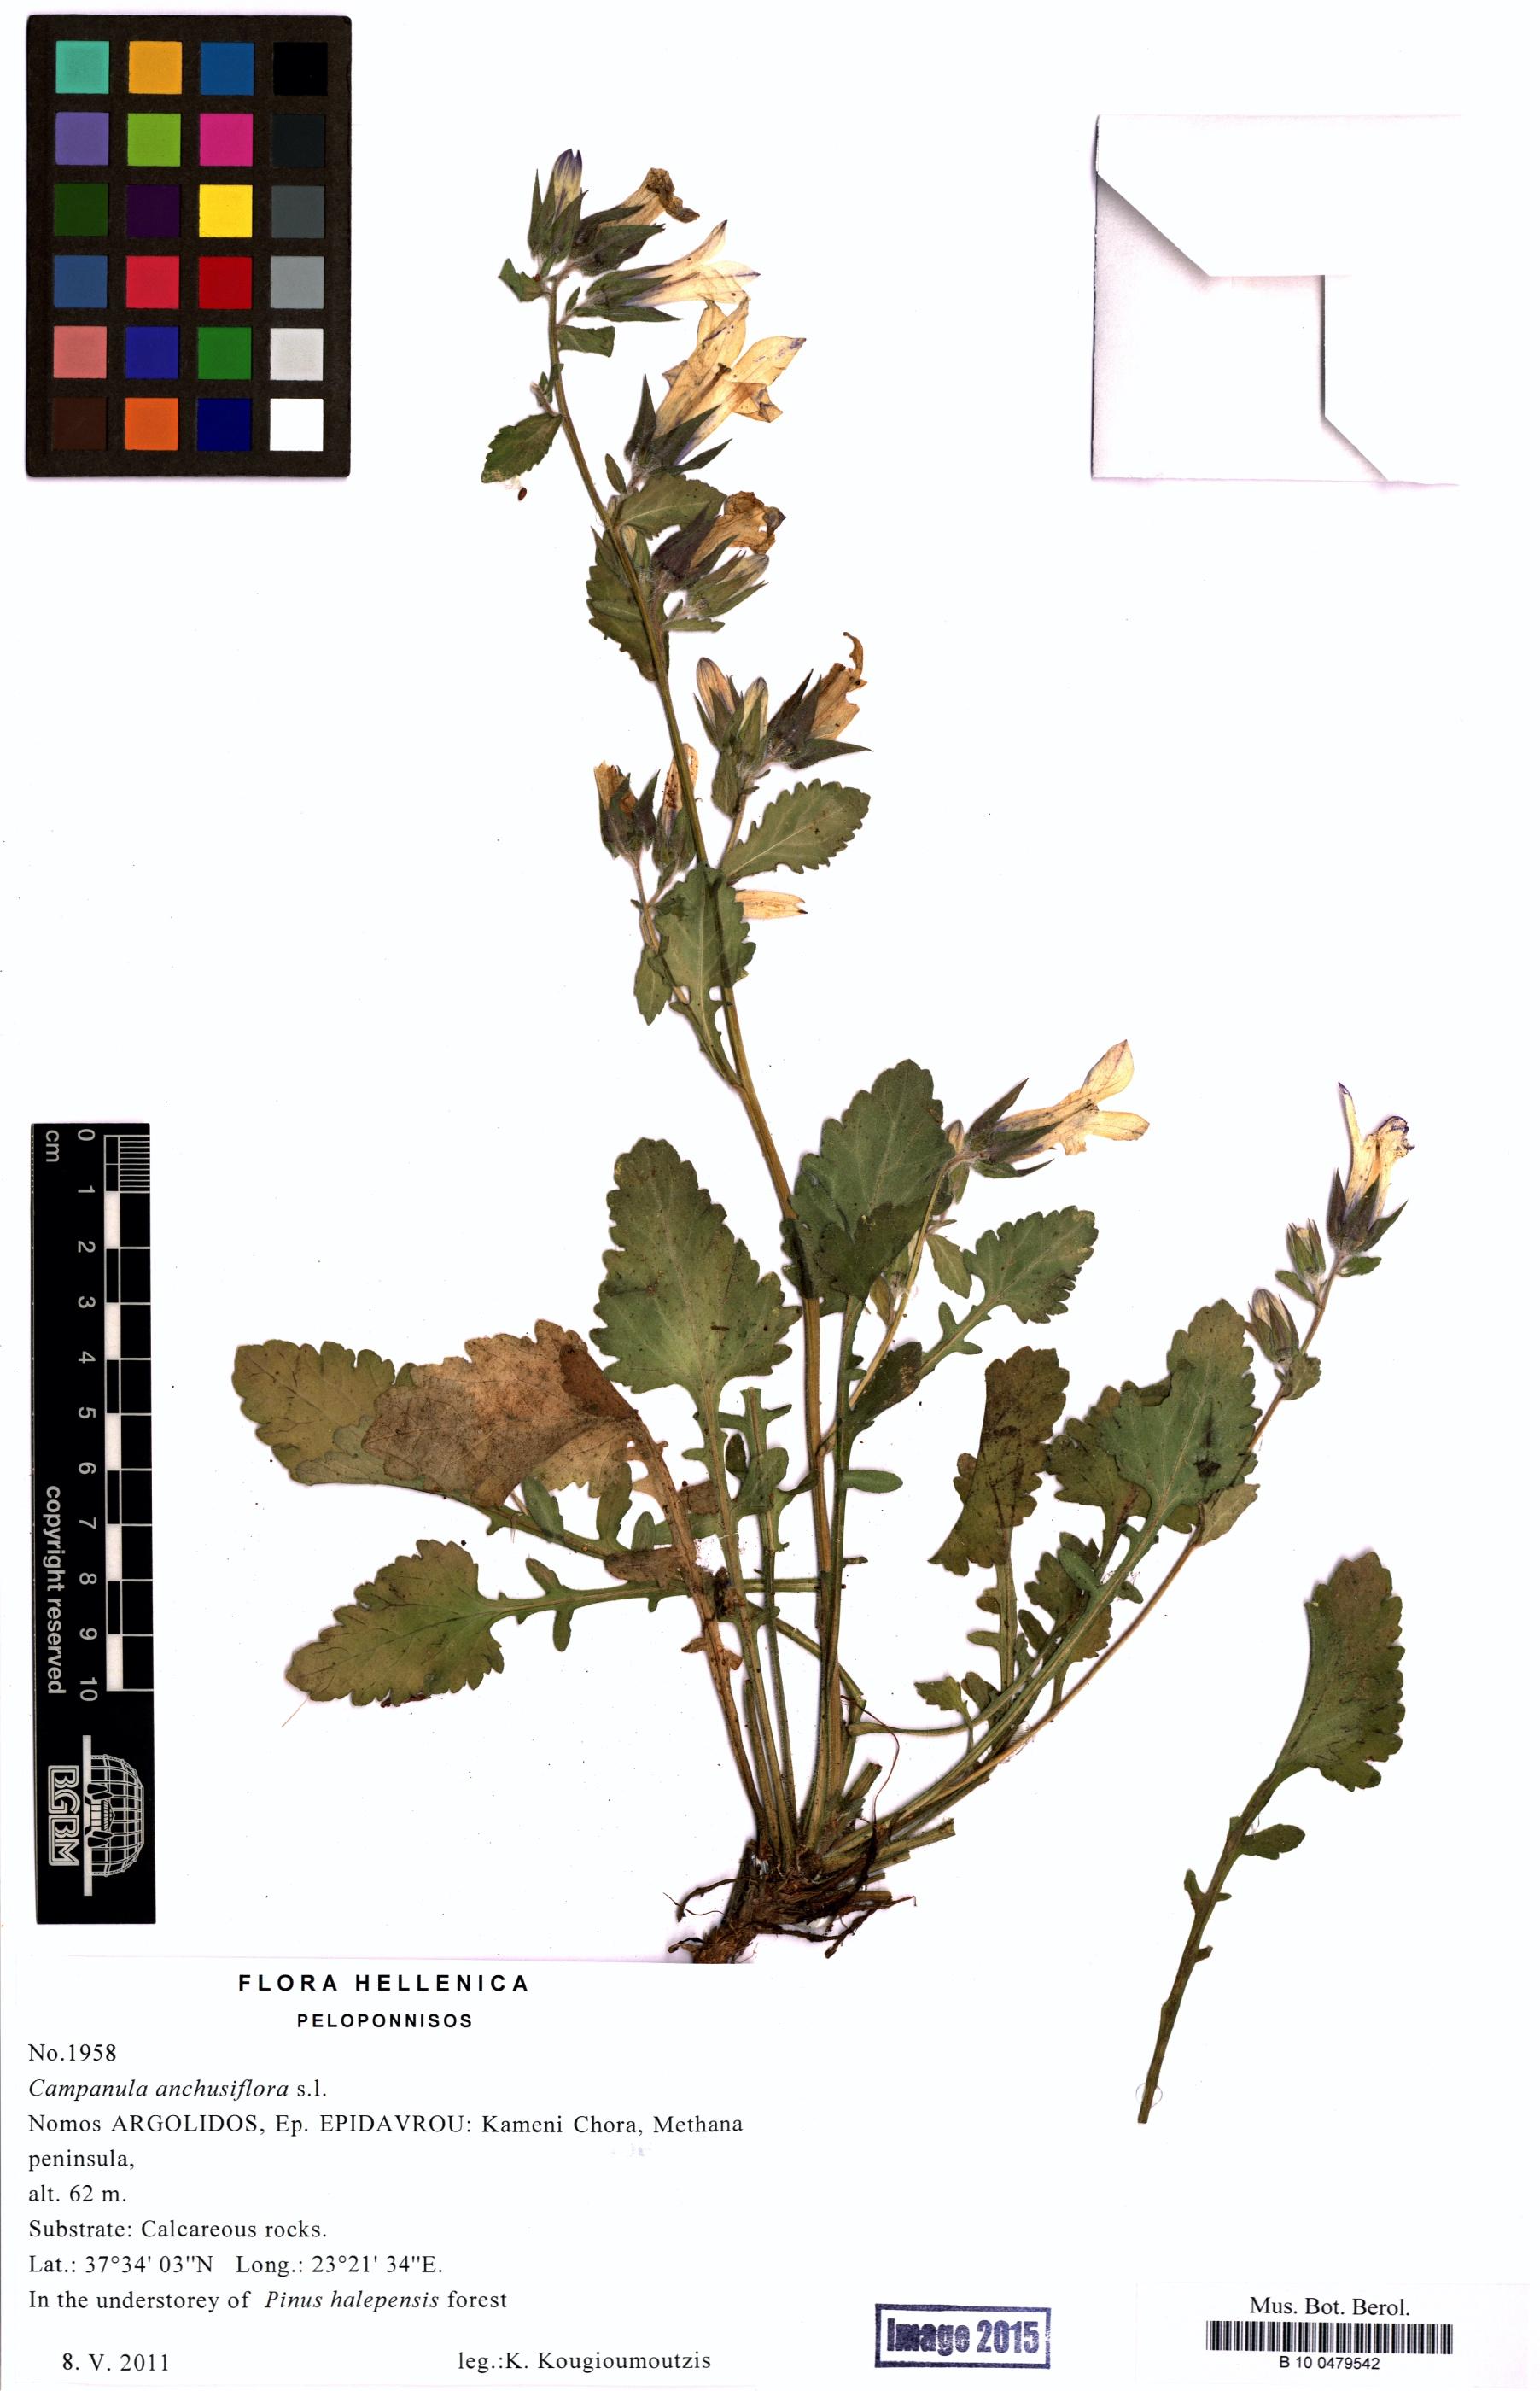 http://ww2.bgbm.org/herbarium/images/B/10/04/79/54/B_10_0479542.jpg